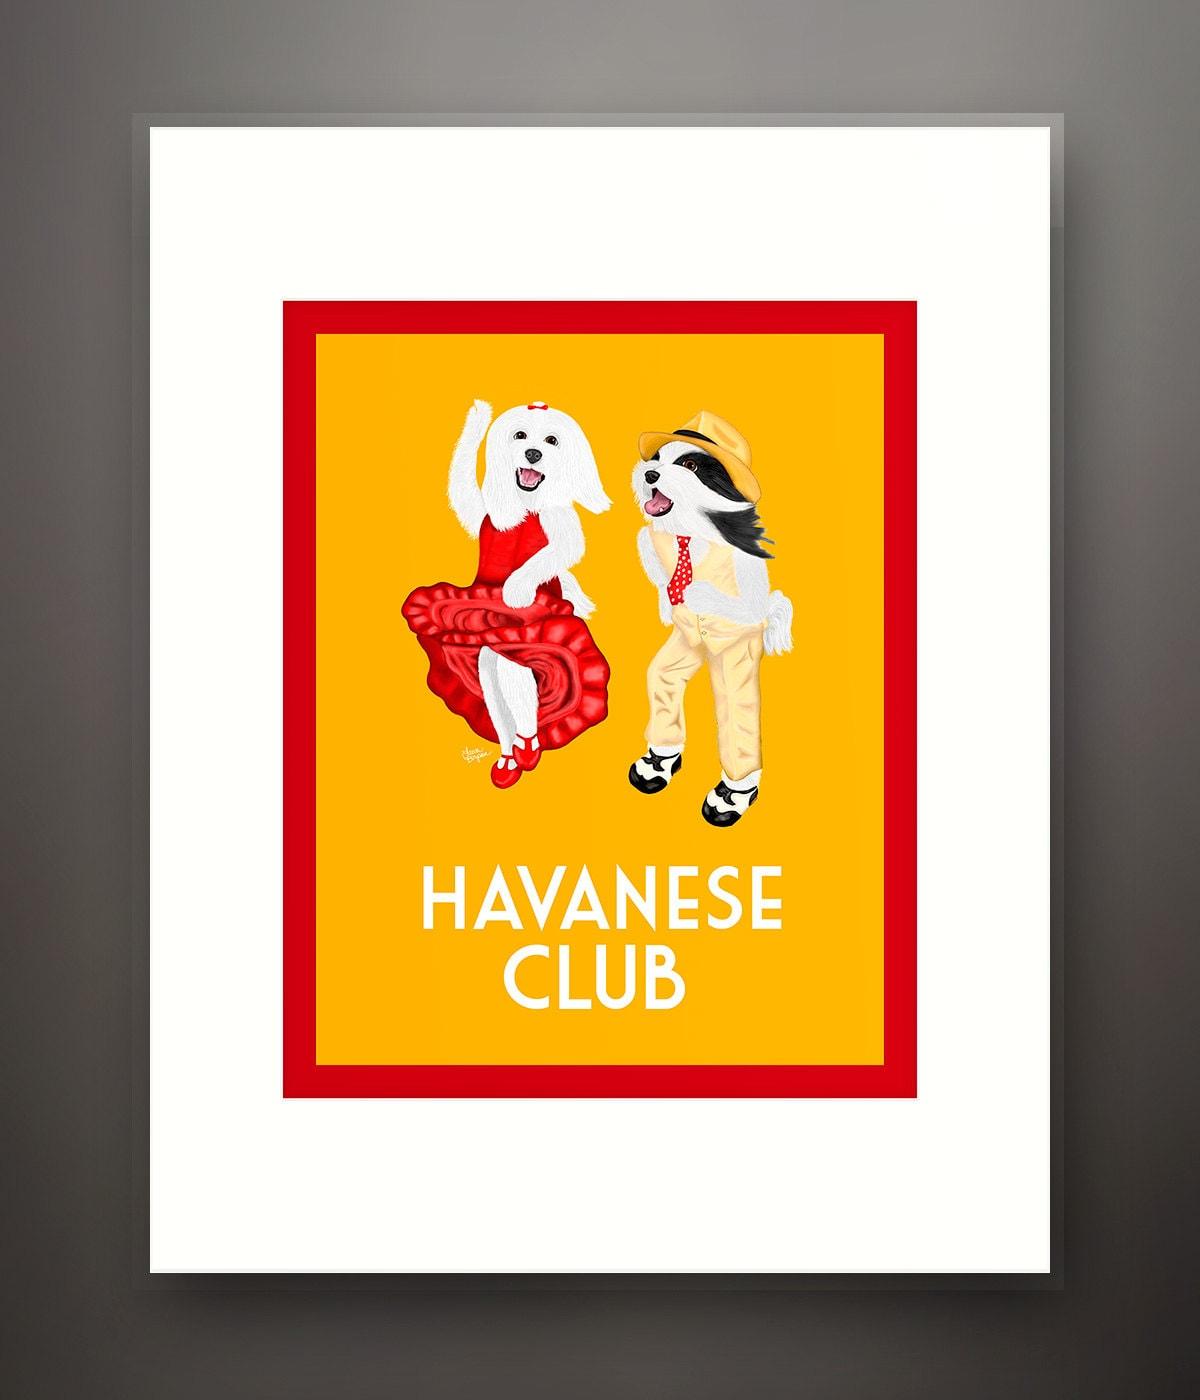 Havaneser Hund verfilzt 8 x 10 Print Frame passt 11 x 14   Etsy